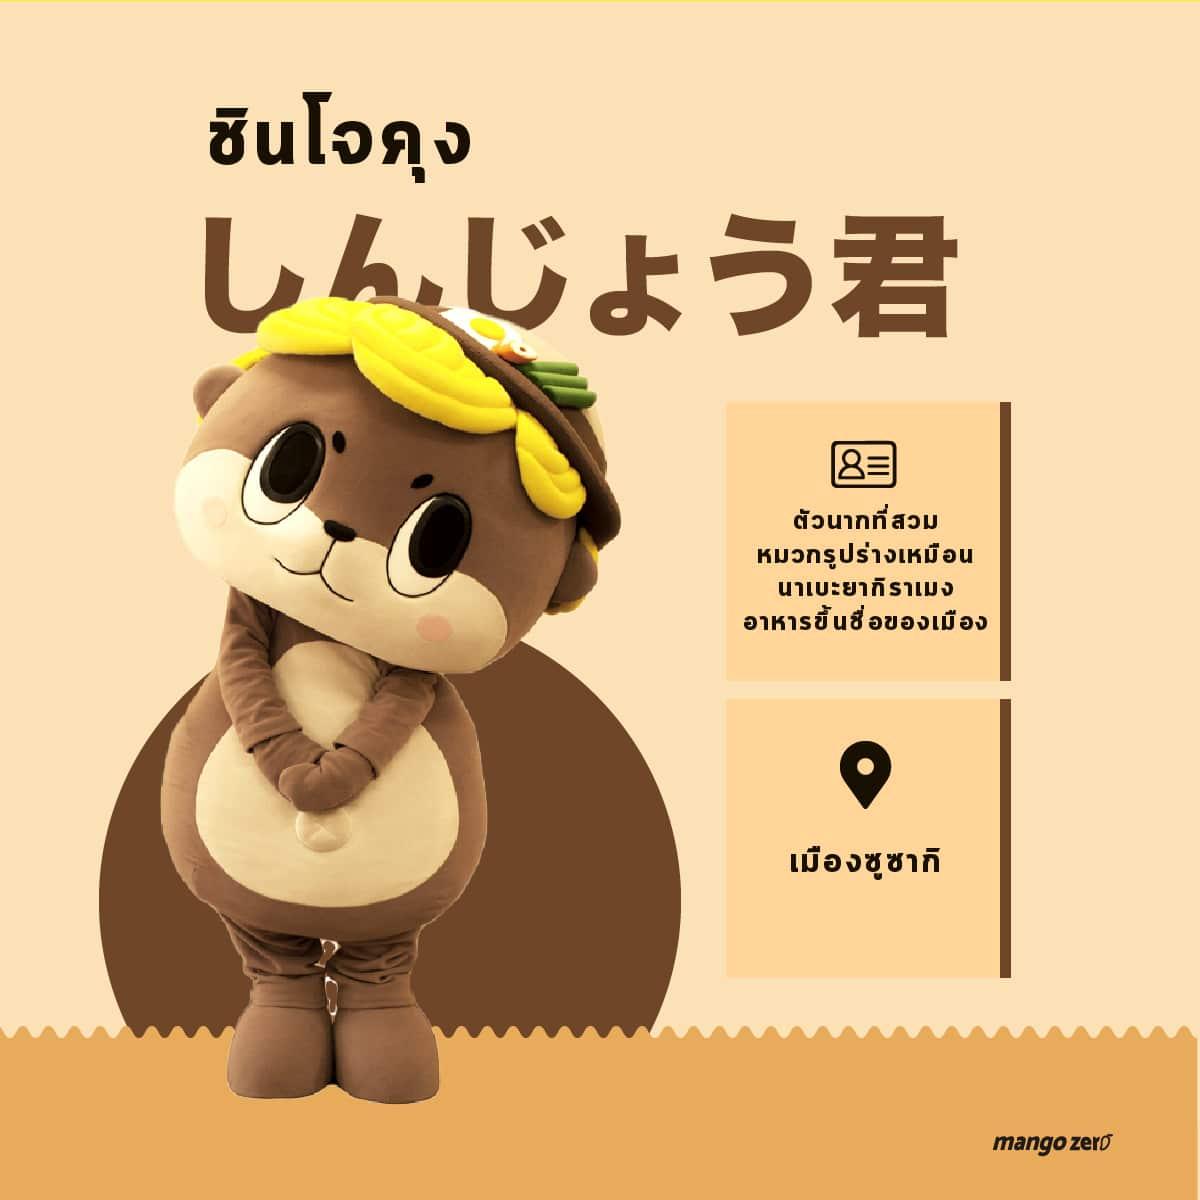 8-cute-mascots-in-japan-06-05